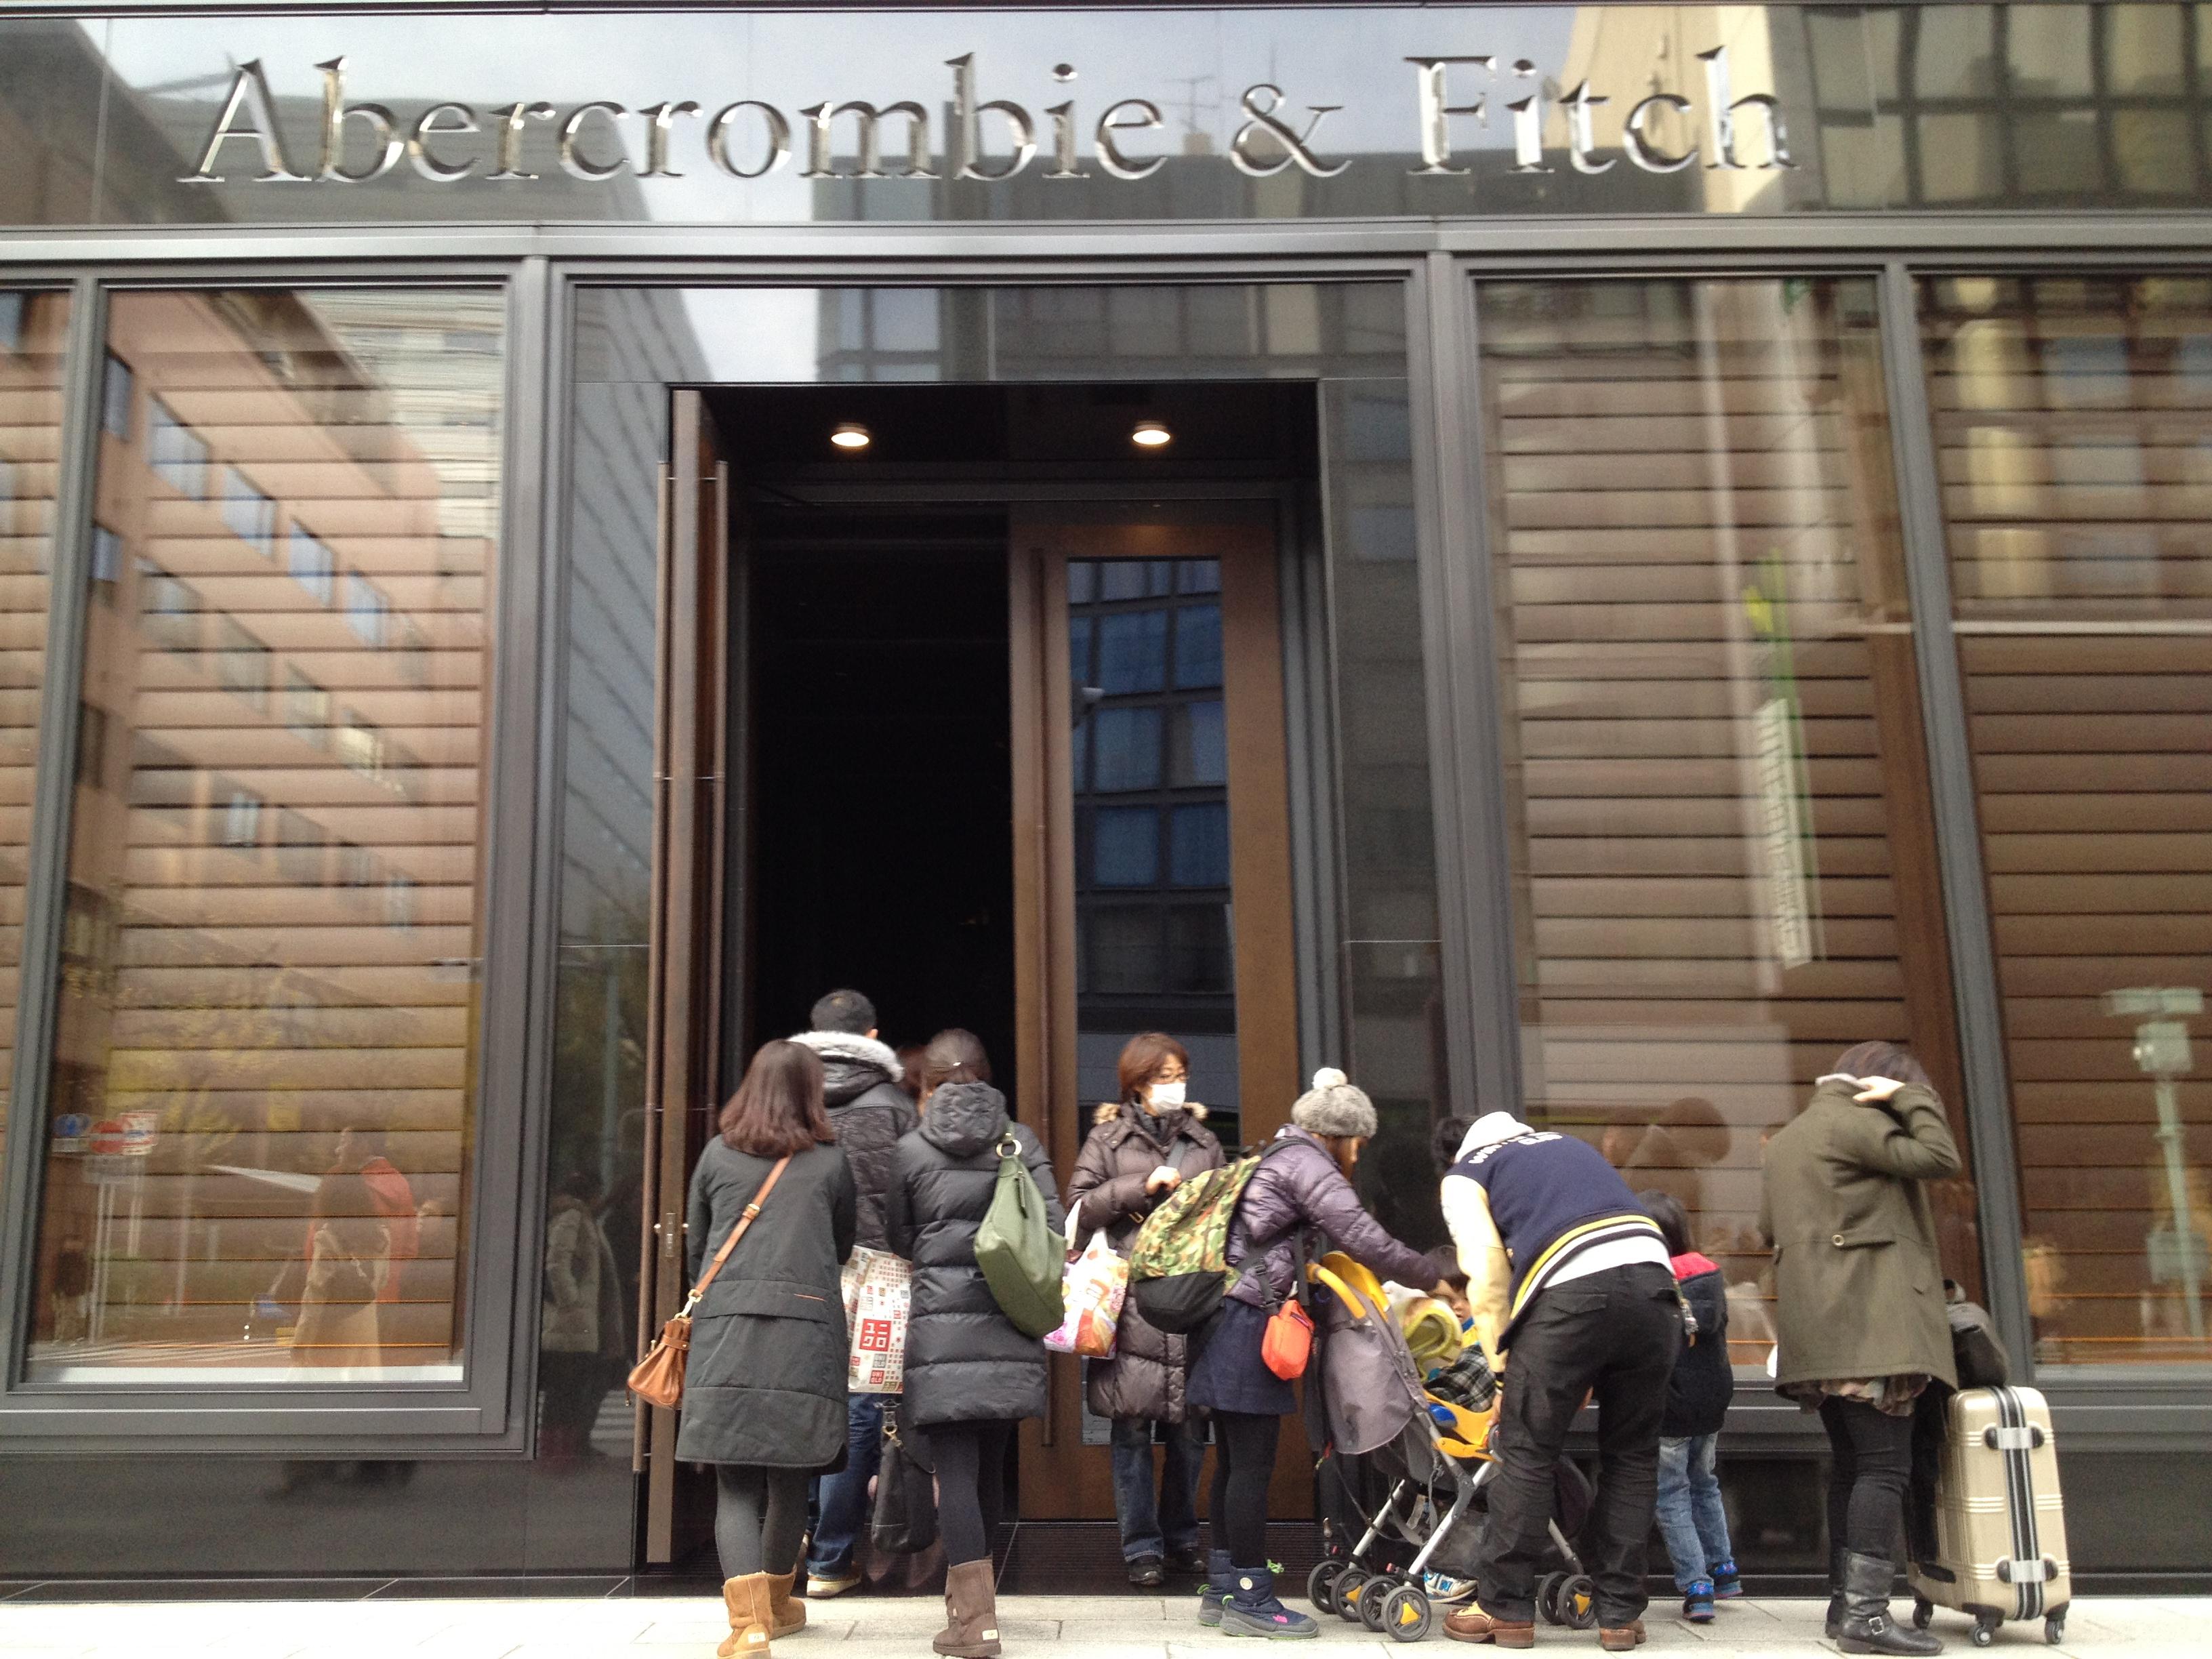 Tienda Abercrombie